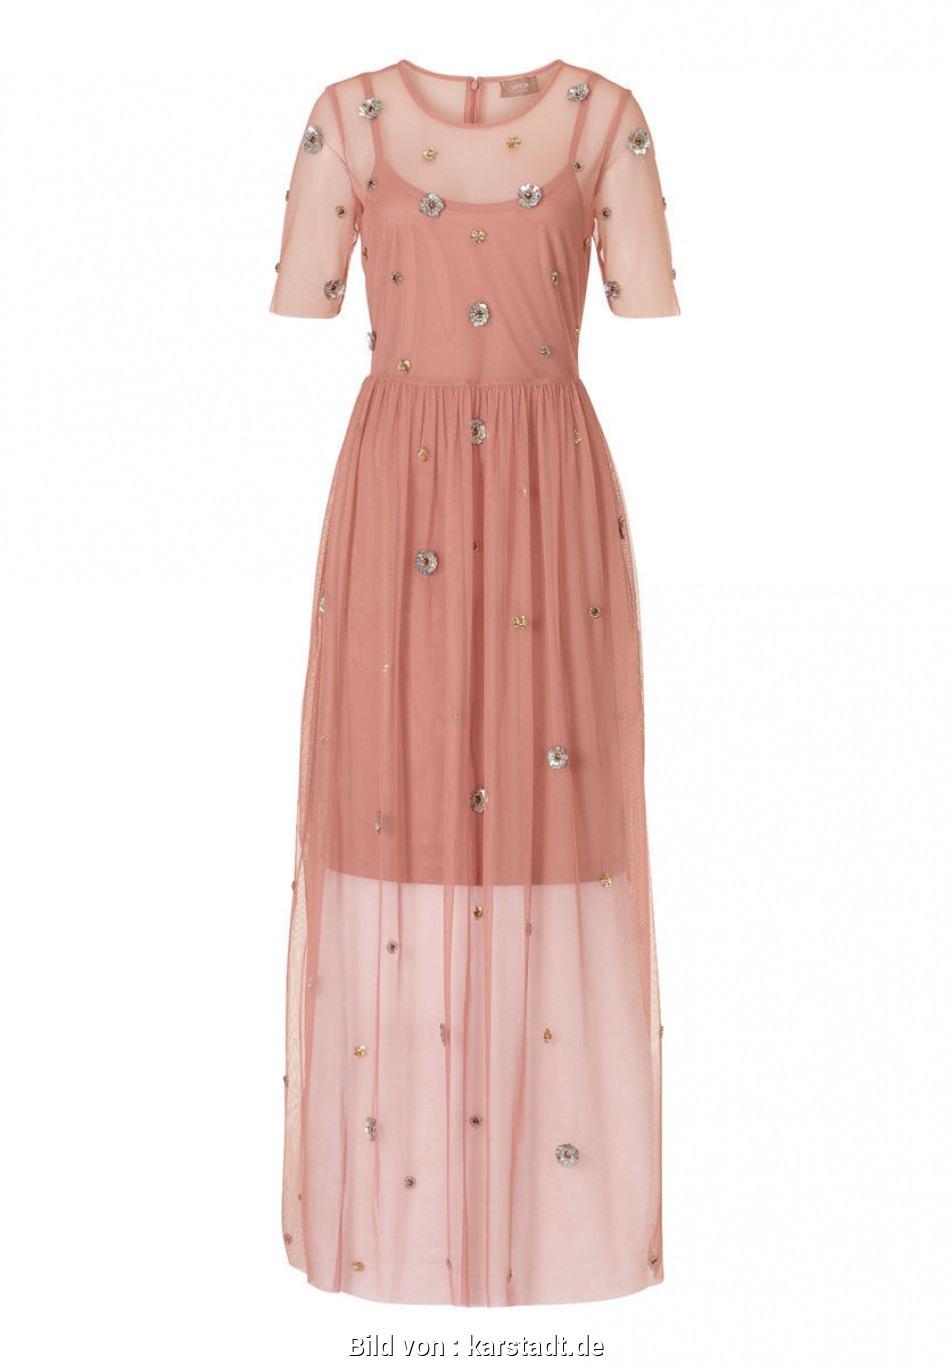 15 Elegant Karstadt Abendkleid Ärmel10 Spektakulär Karstadt Abendkleid Design